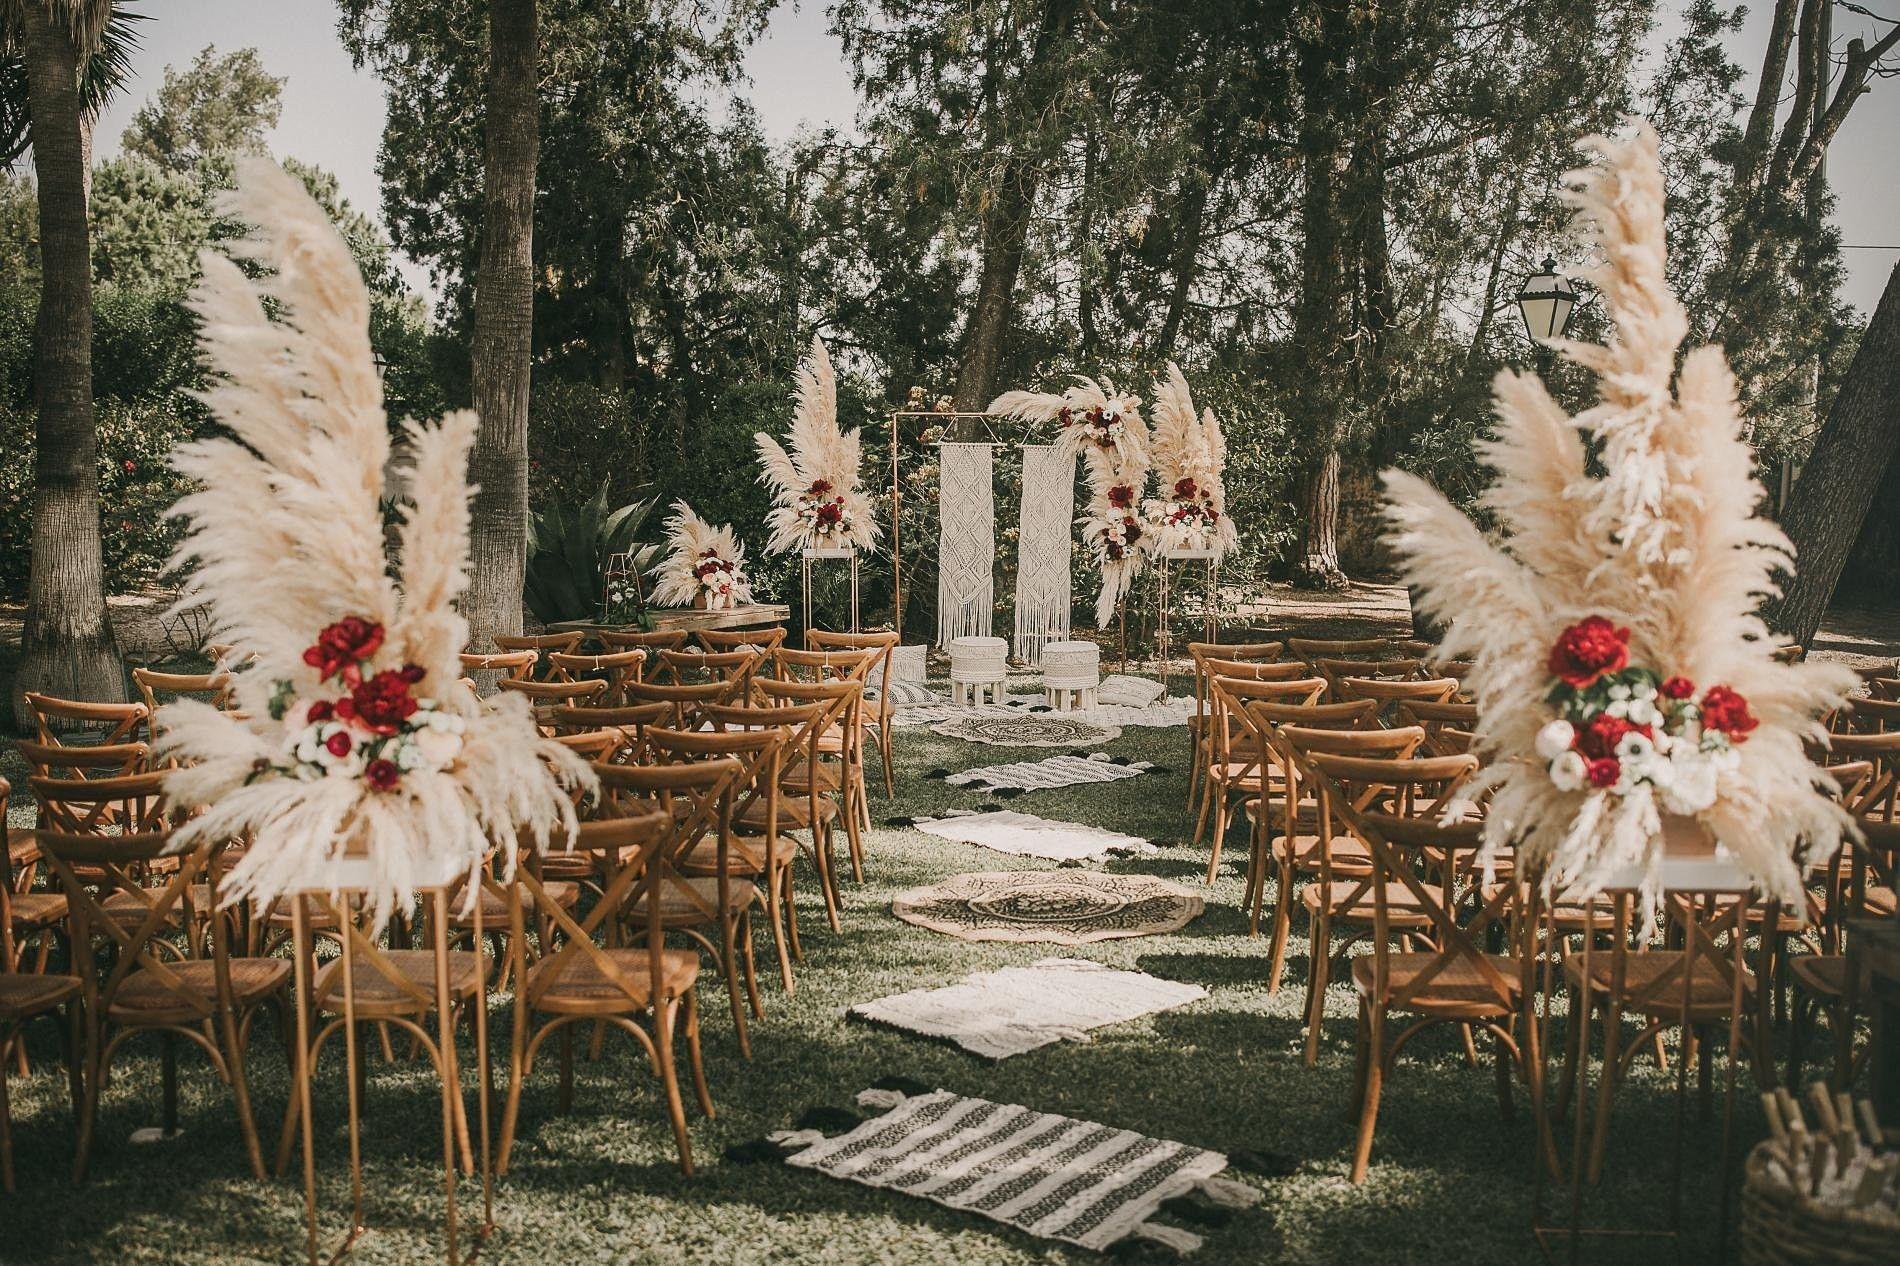 e93c6f5c Ceremonia civil, ceremony, finca ficus girona, wedding planner, Spain,  España, Alicante, inspiración, inspo, inspiration, carpets, alfombras,  pampas grass, ...